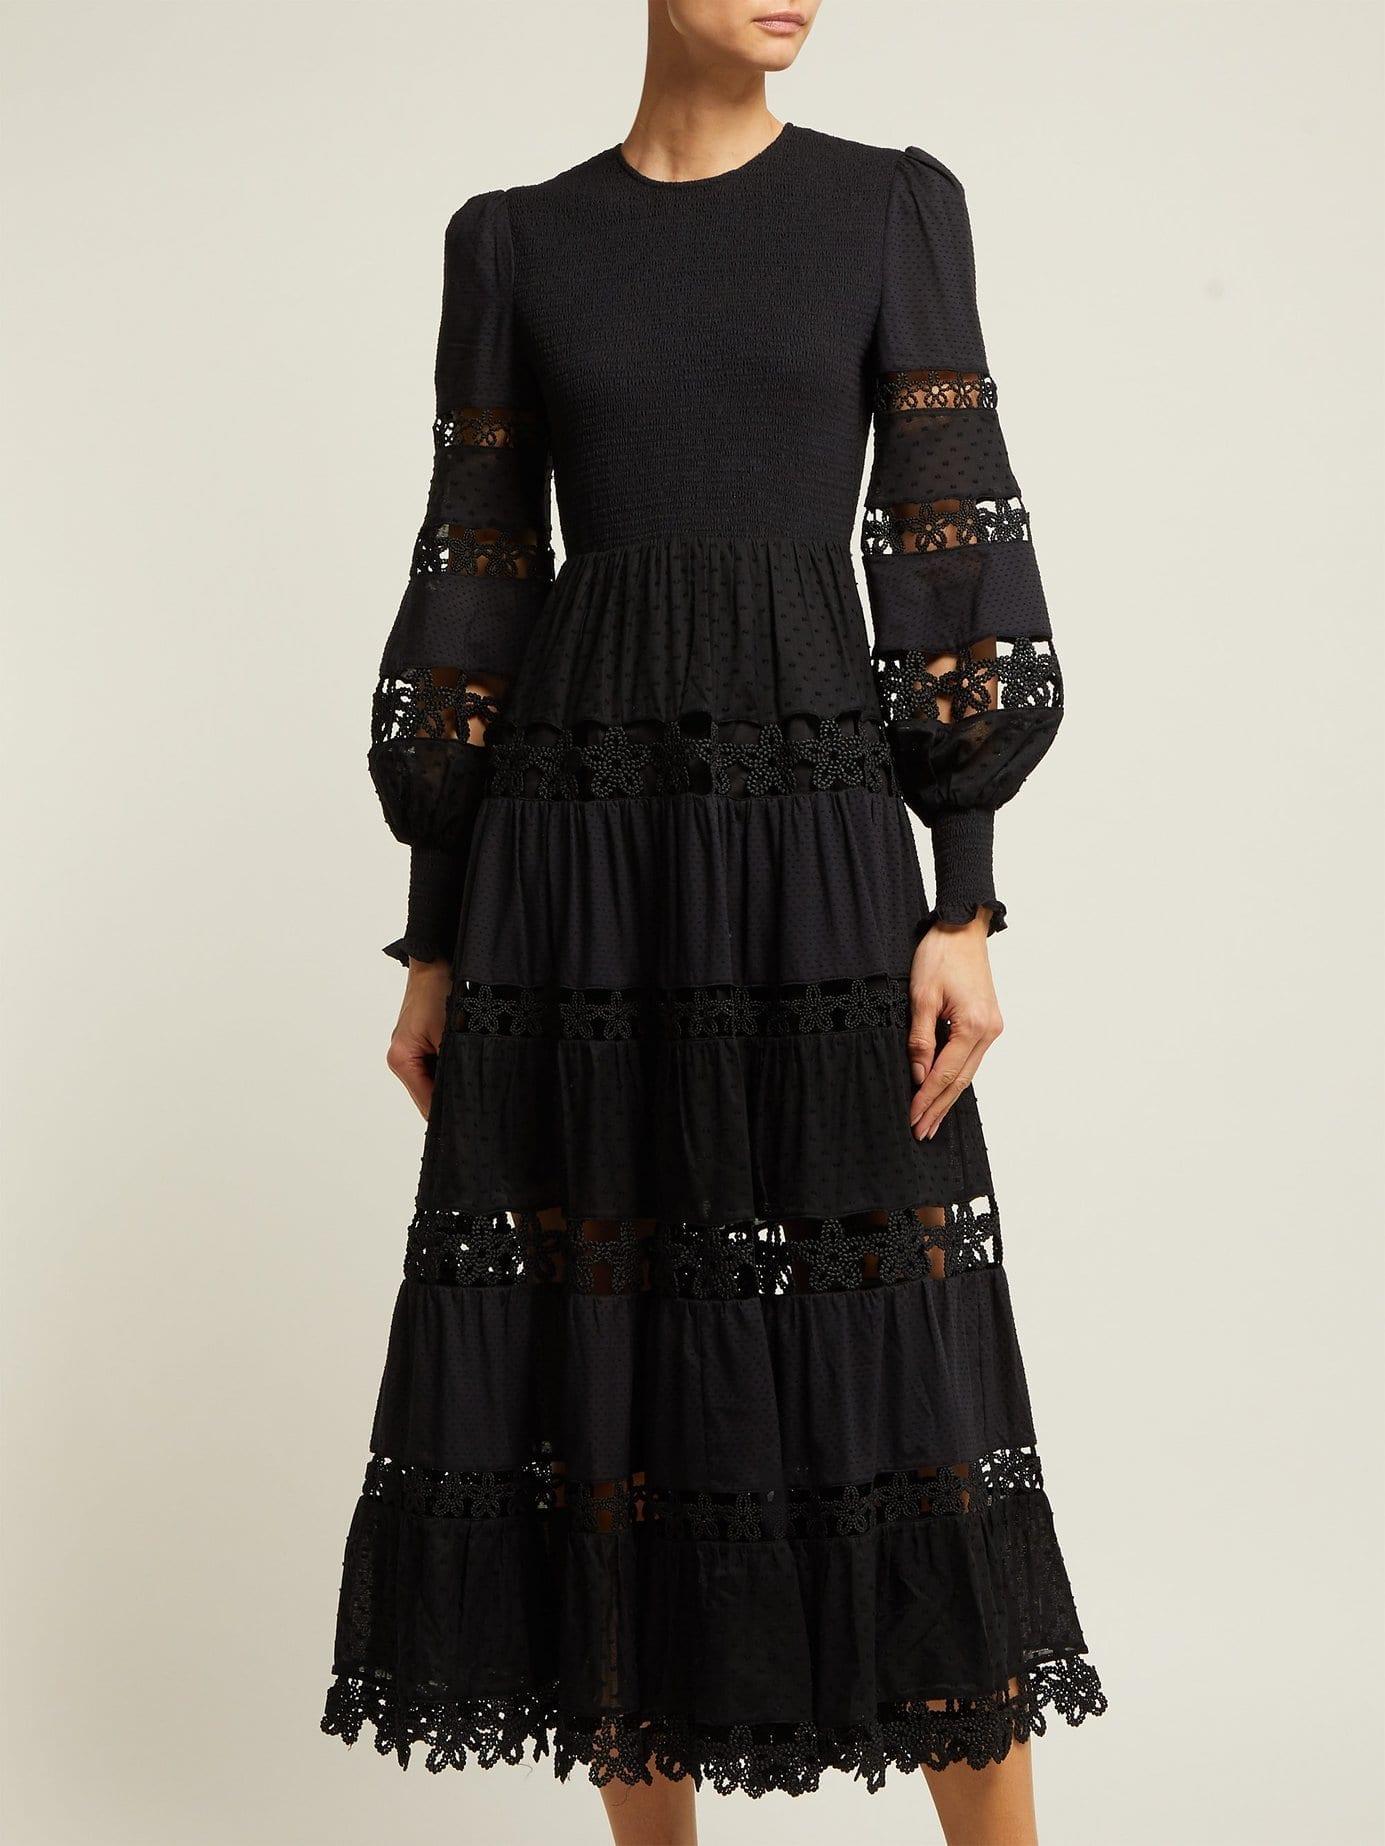 Zimmermann Primrose Lace Insert Cotton Black Dress We